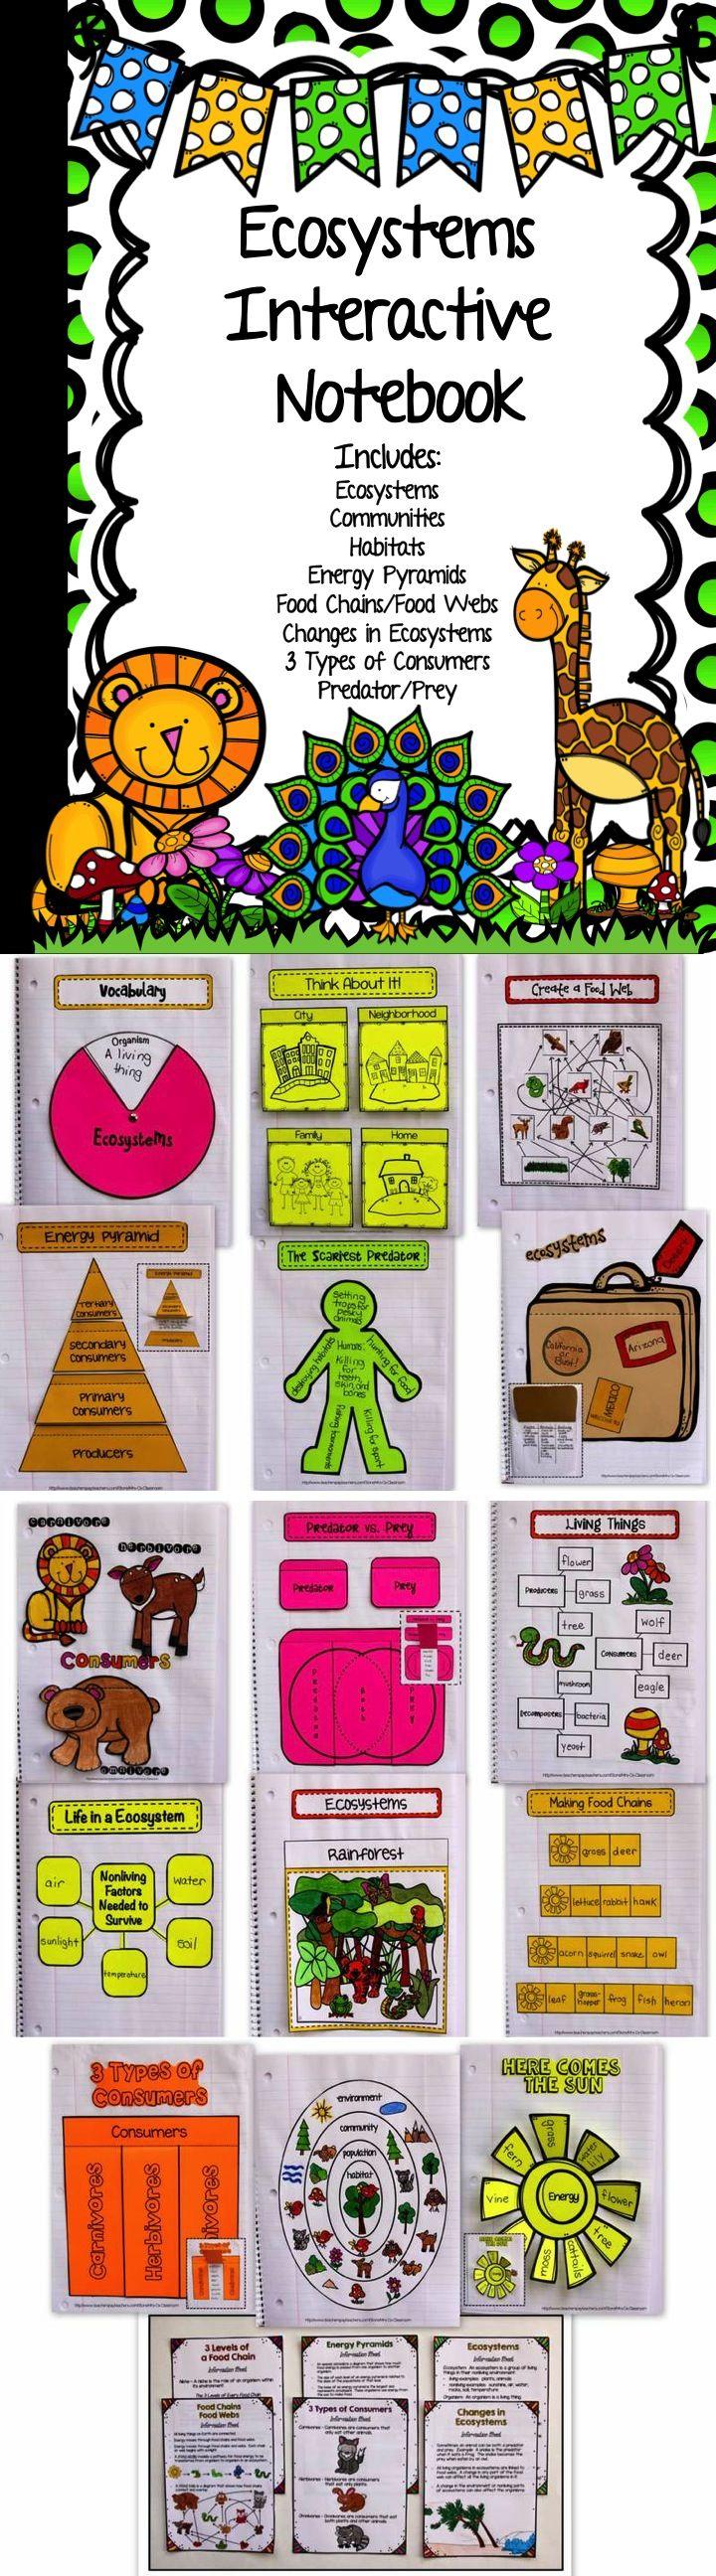 lab 6 population types essay Ap biology 2004-2005 essay 2000 ap biology 2004-2005 lab 6: molecular biology ap biology 2004-2005 lab 8: population genetics.